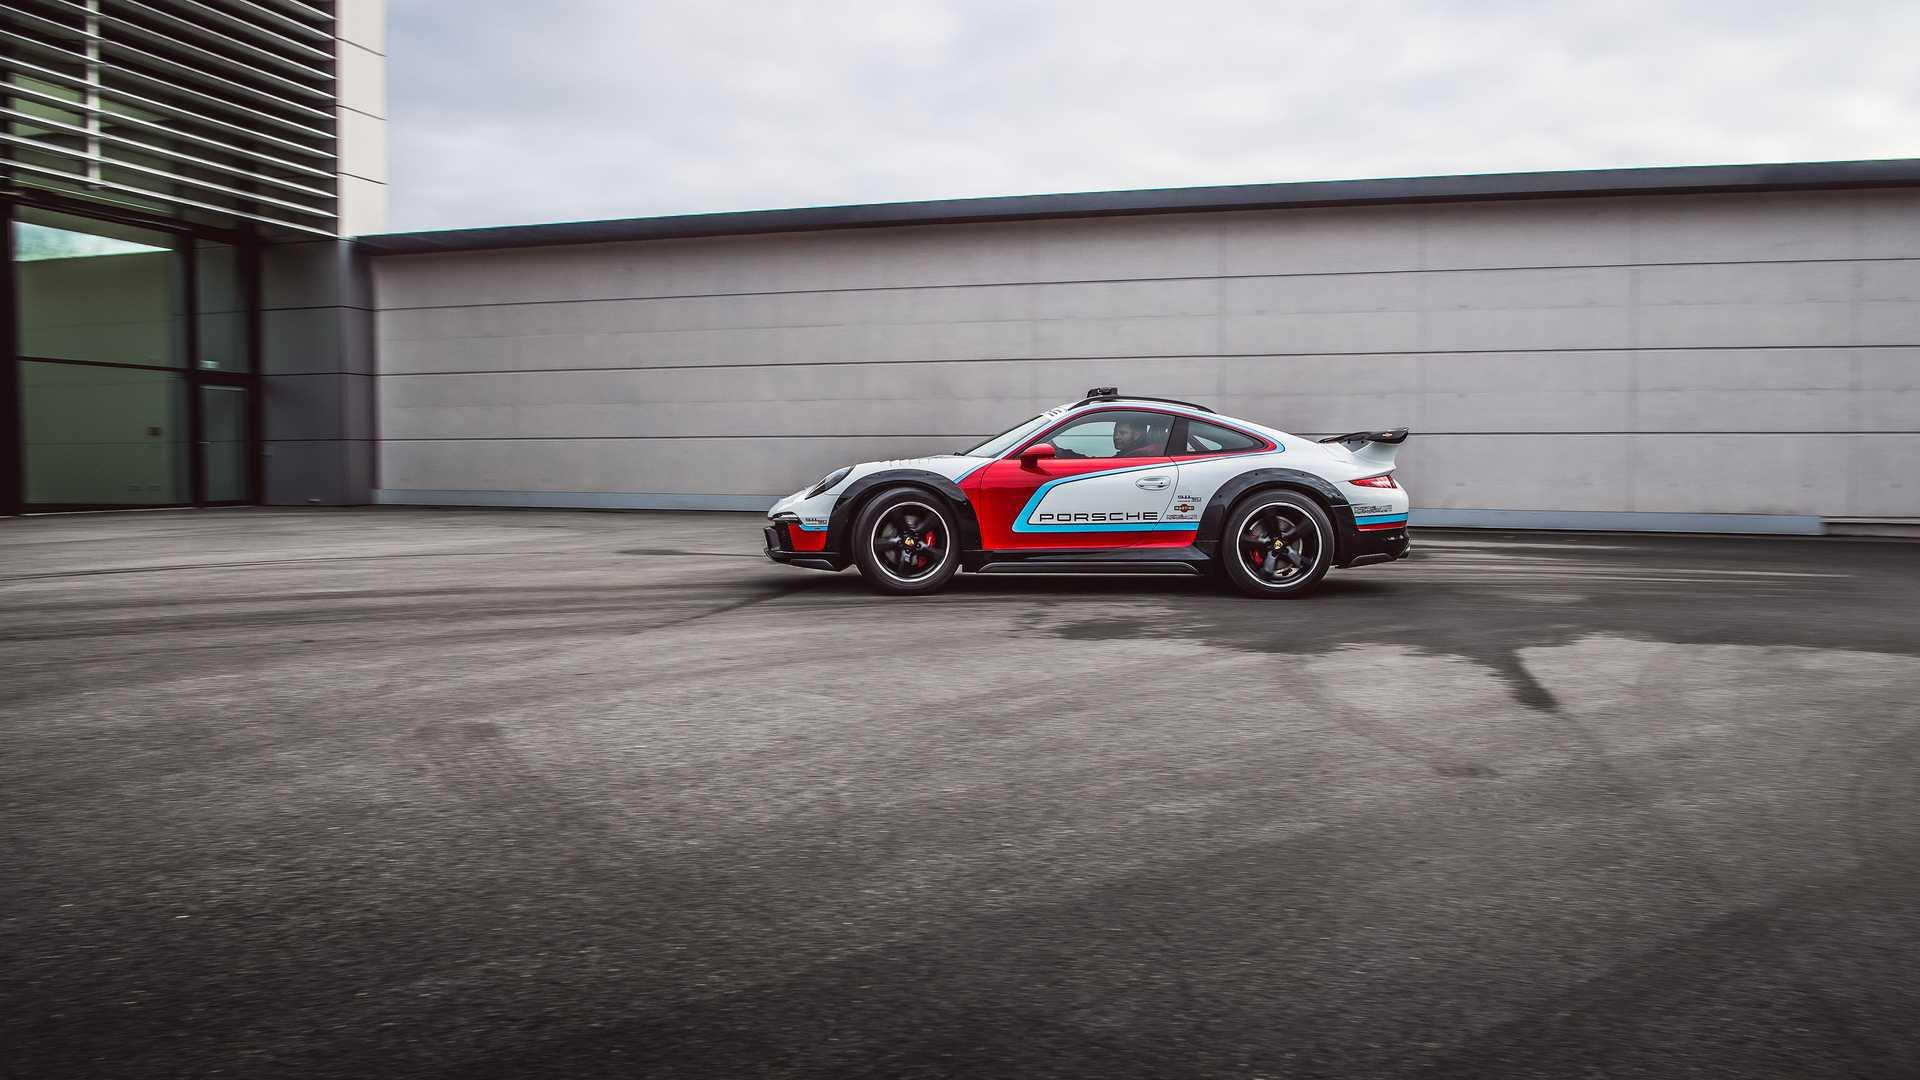 Porsche-911-Vision-Safari-6